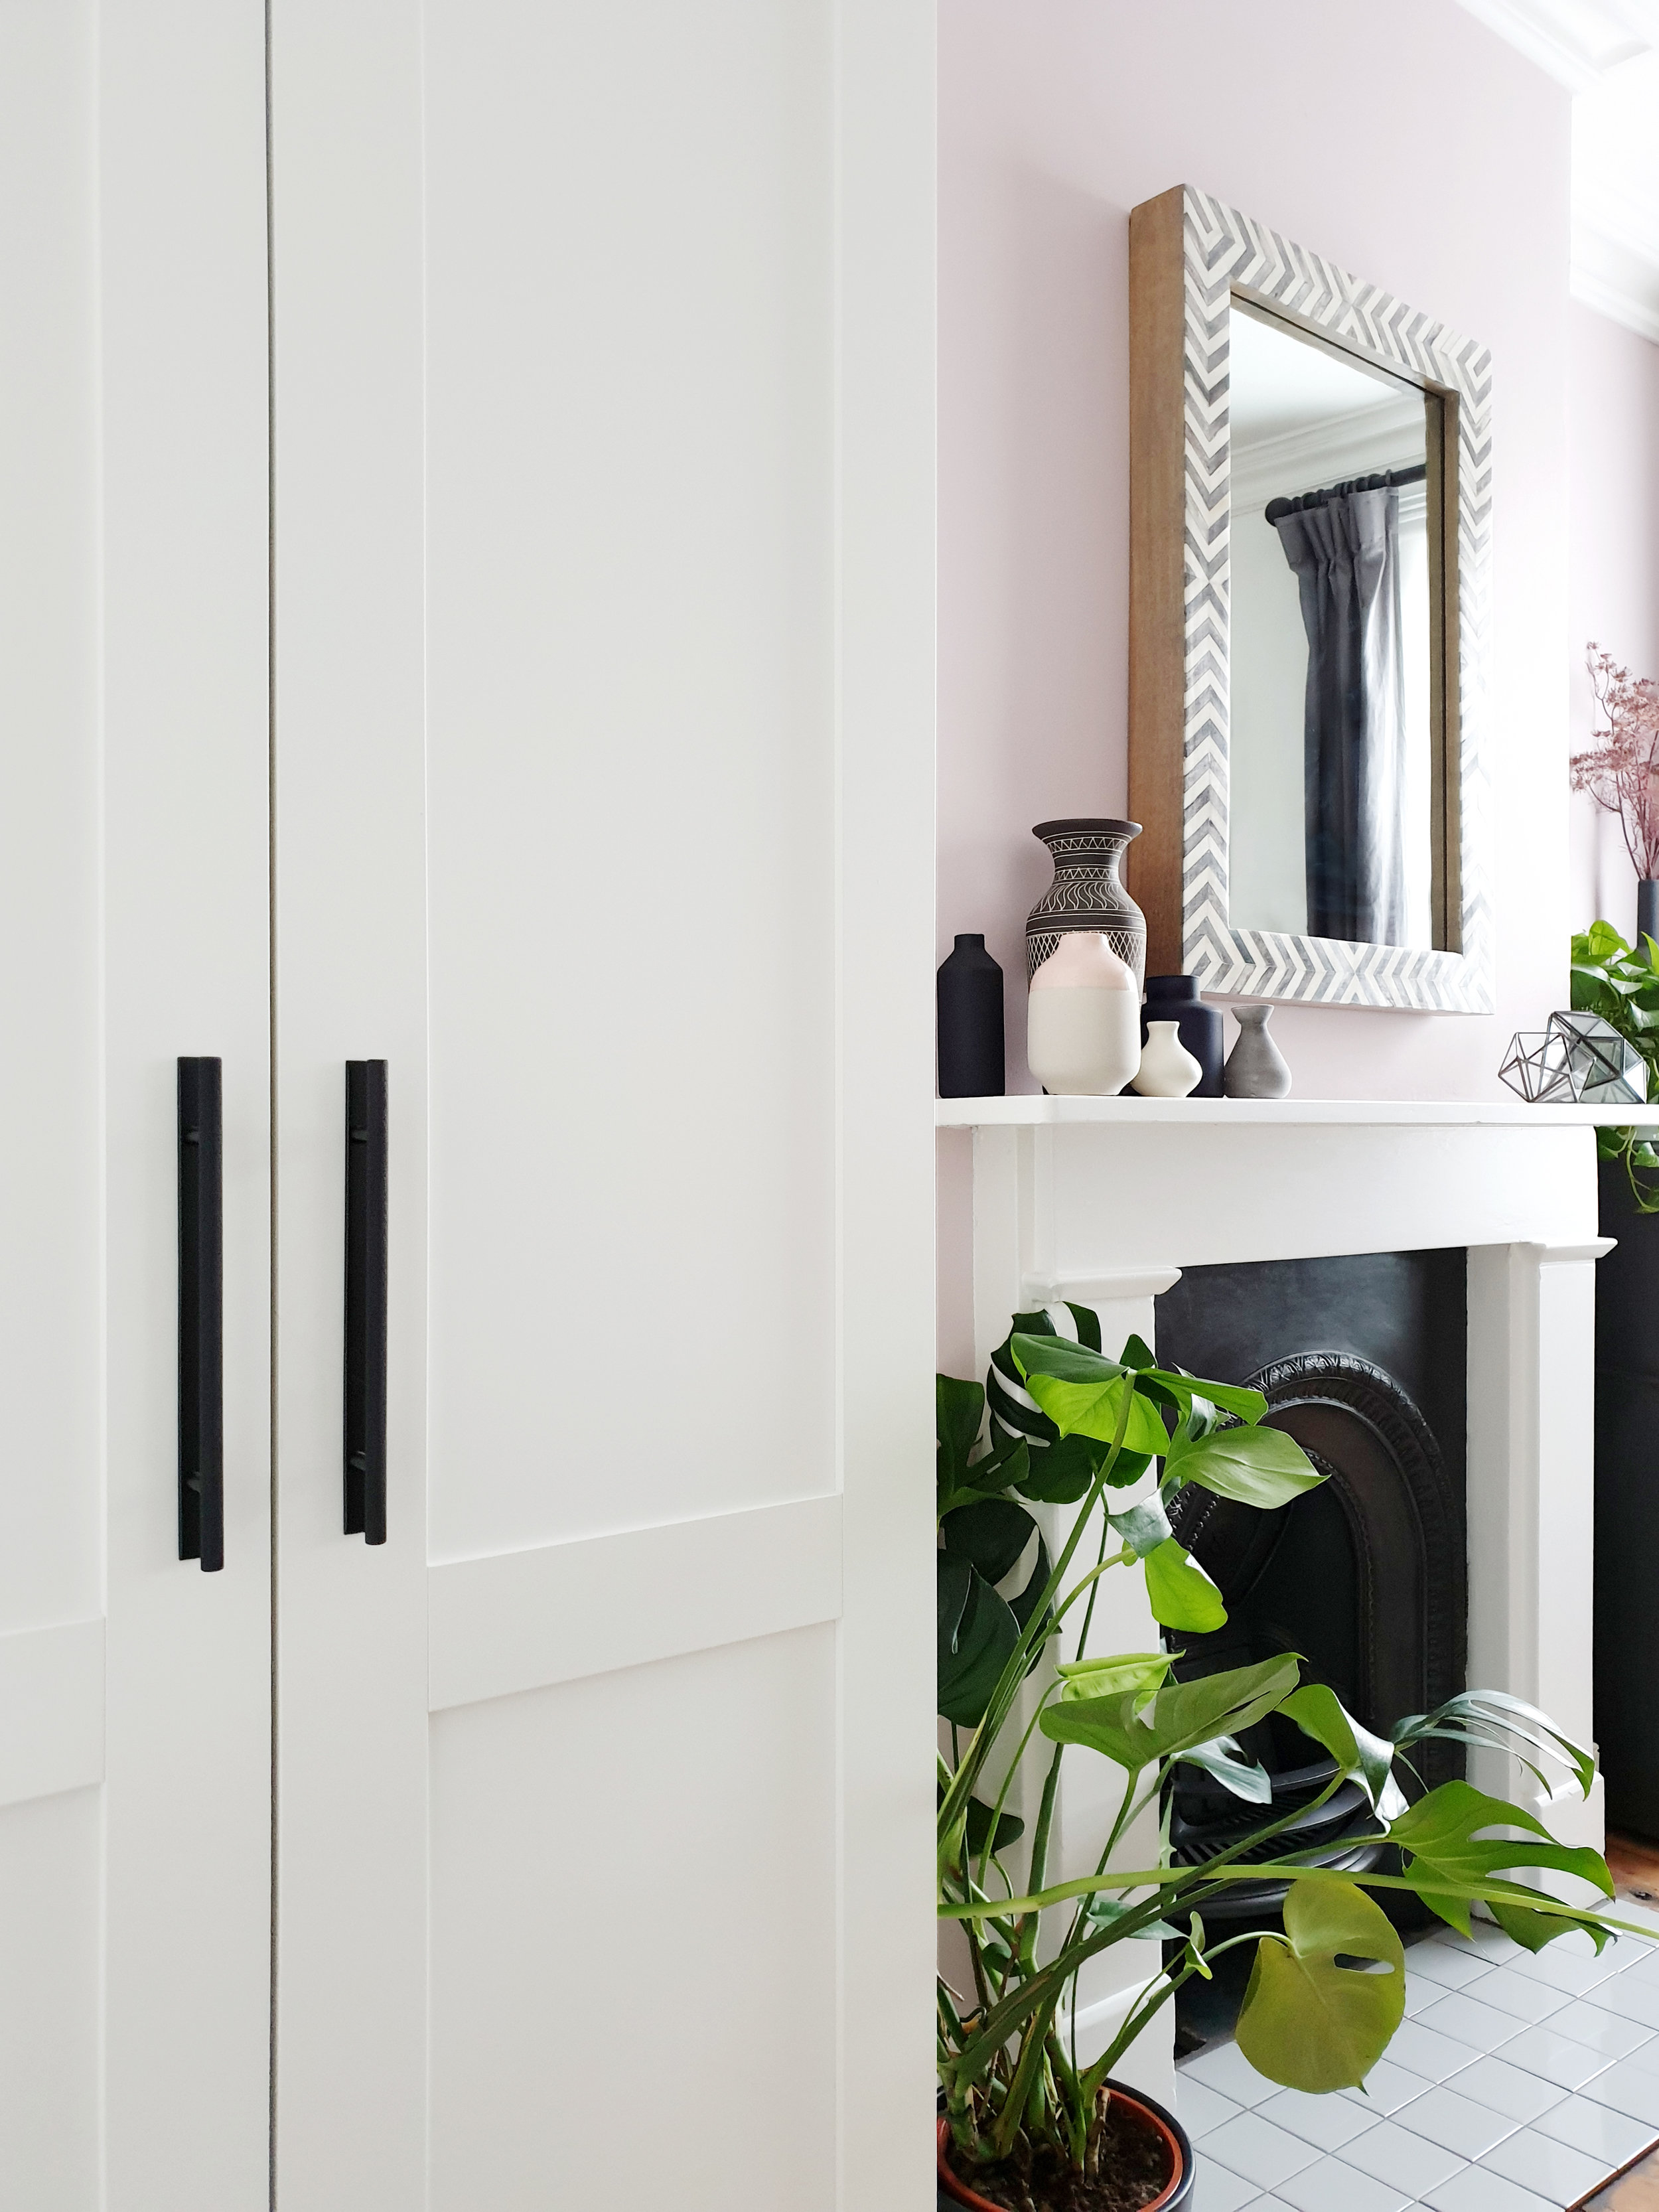 dowsing-reynolds-wardrobe-handles.jpg